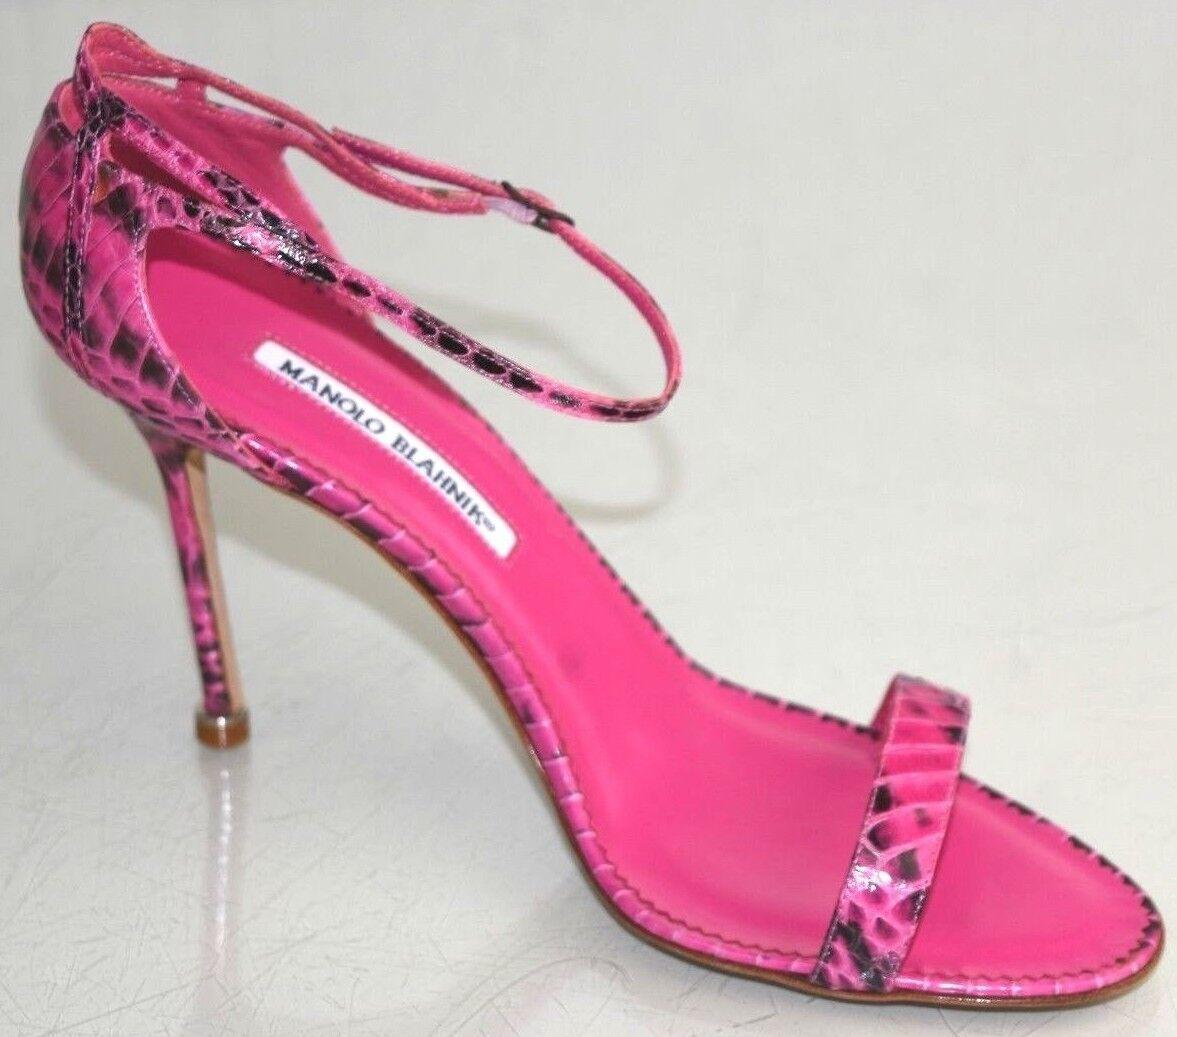 975 New Manolo Blahnik PARI Pink EXOTIC EXOTIC EXOTIC Snakeskin Strappy Sandals shoes 40.5 26de00